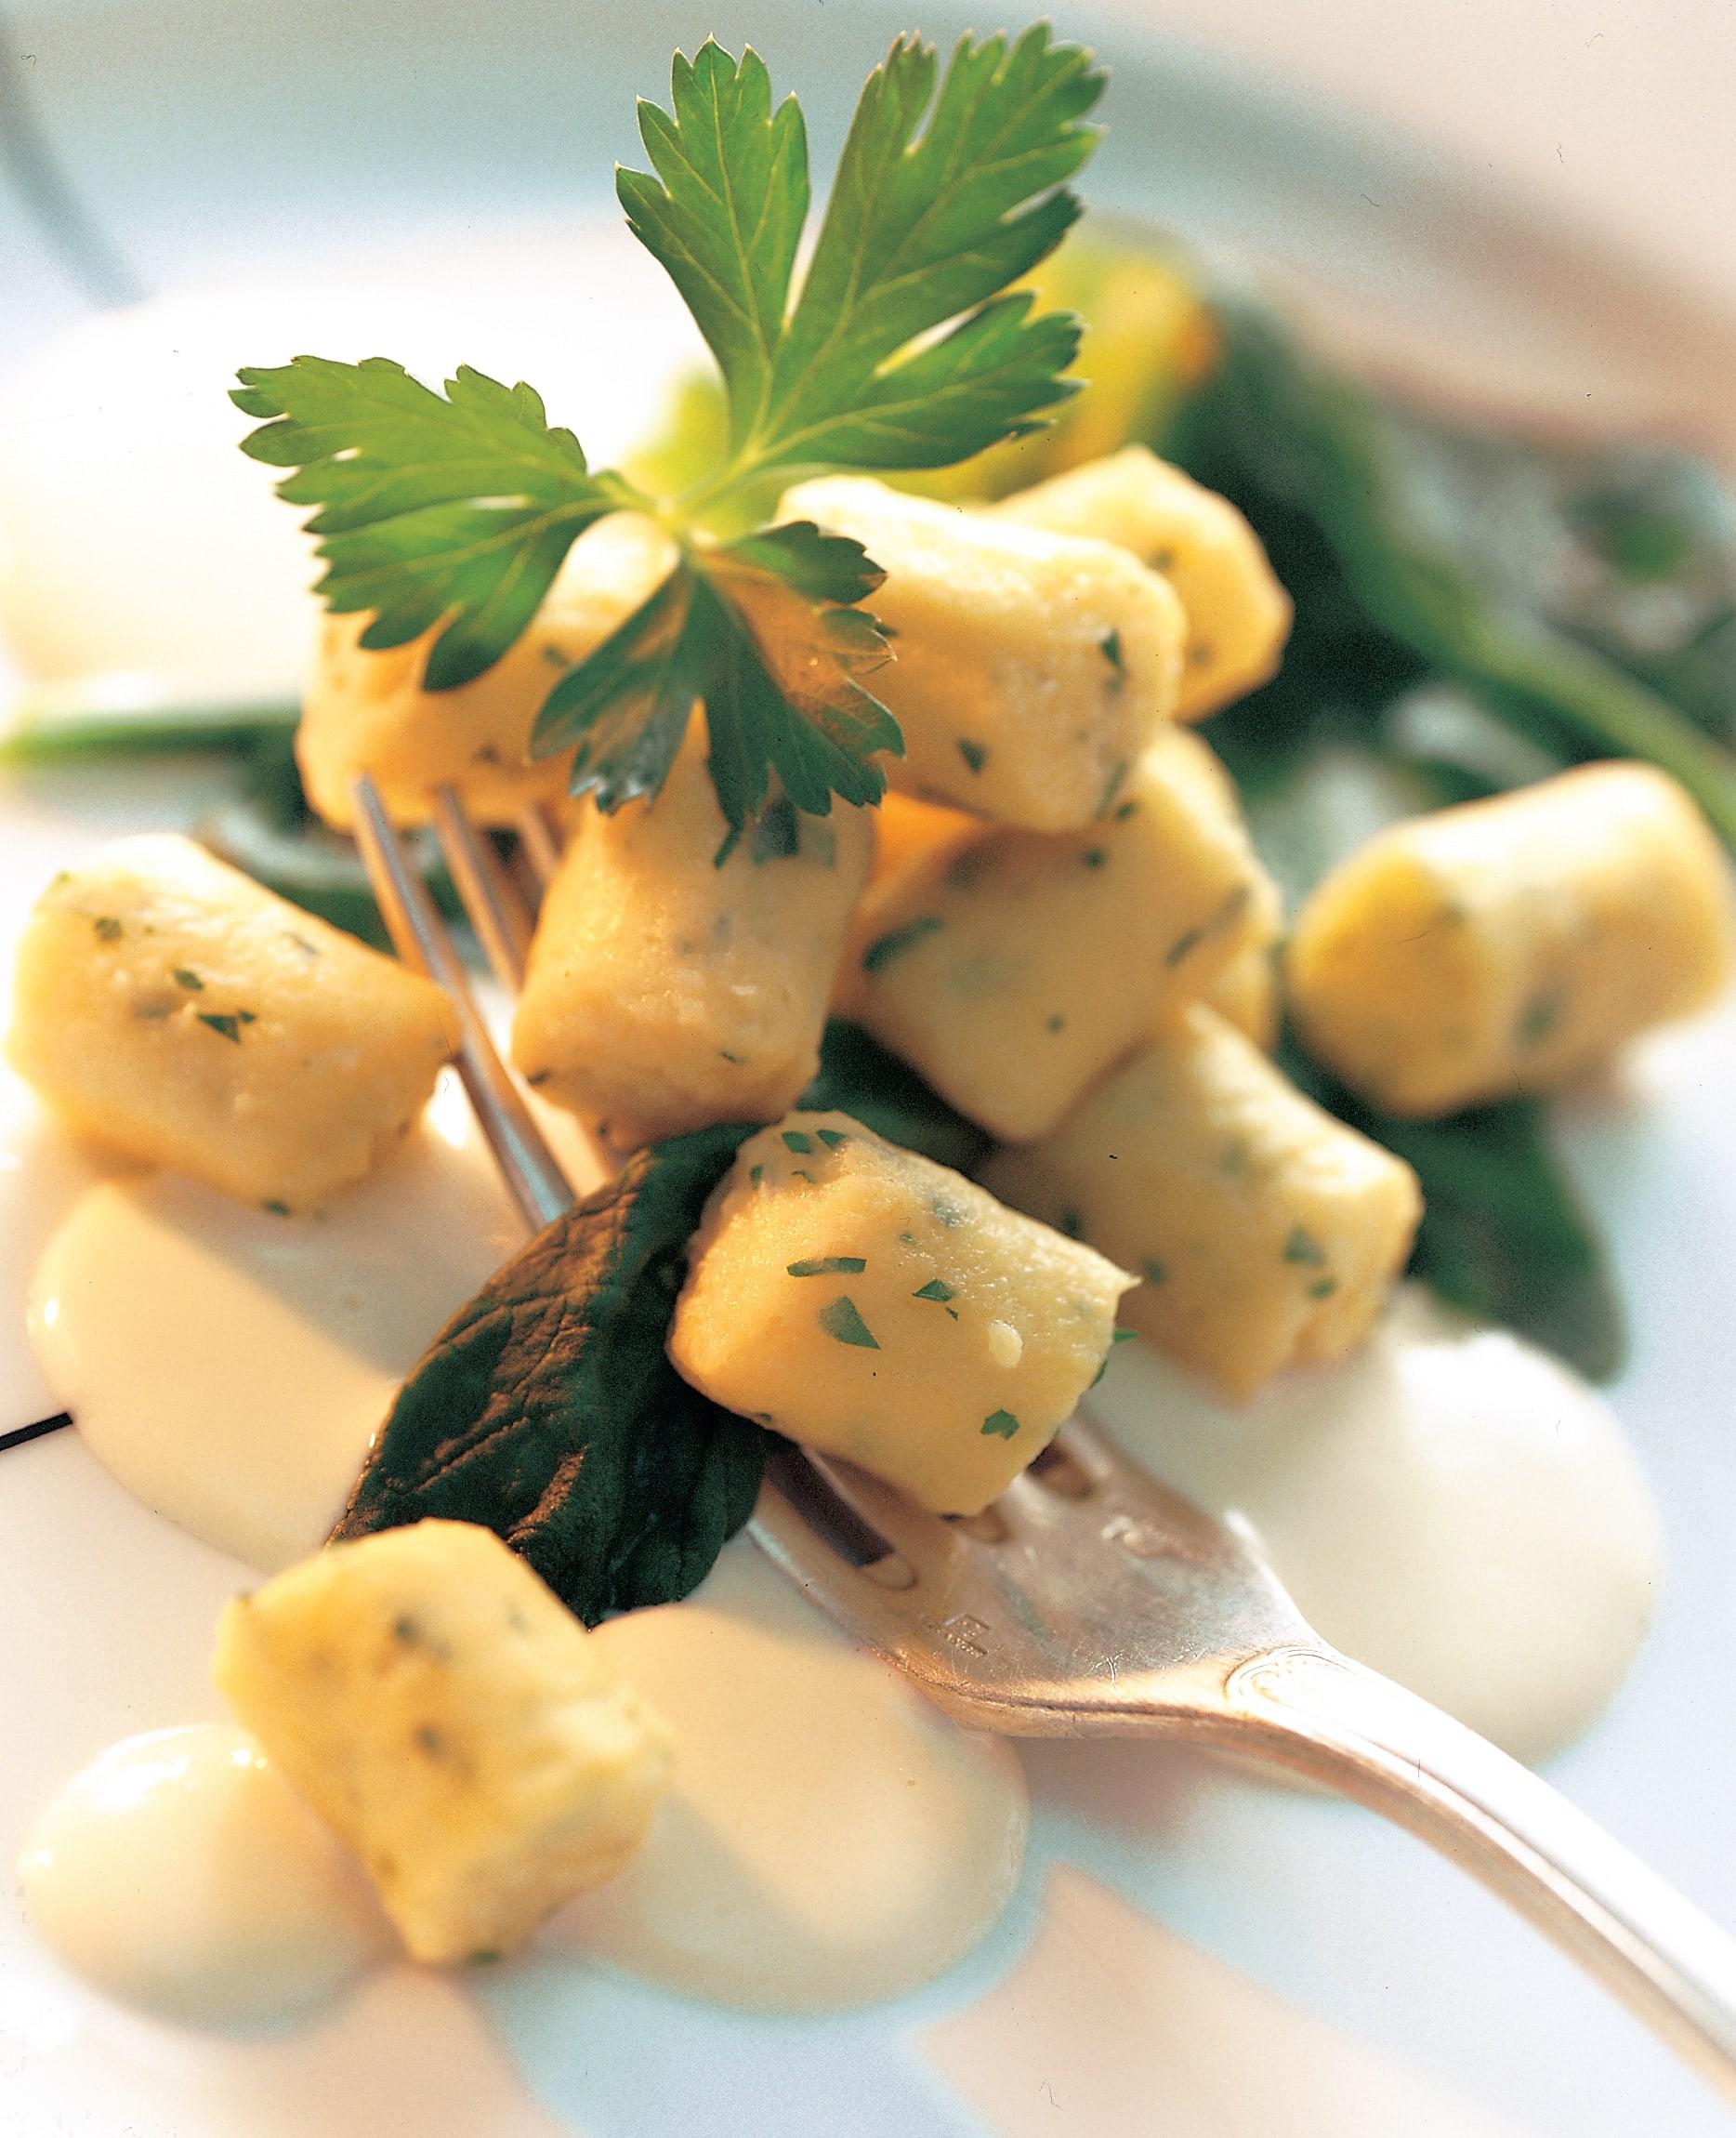 Petersilien-Gnocchi an Mutschli-Sauce